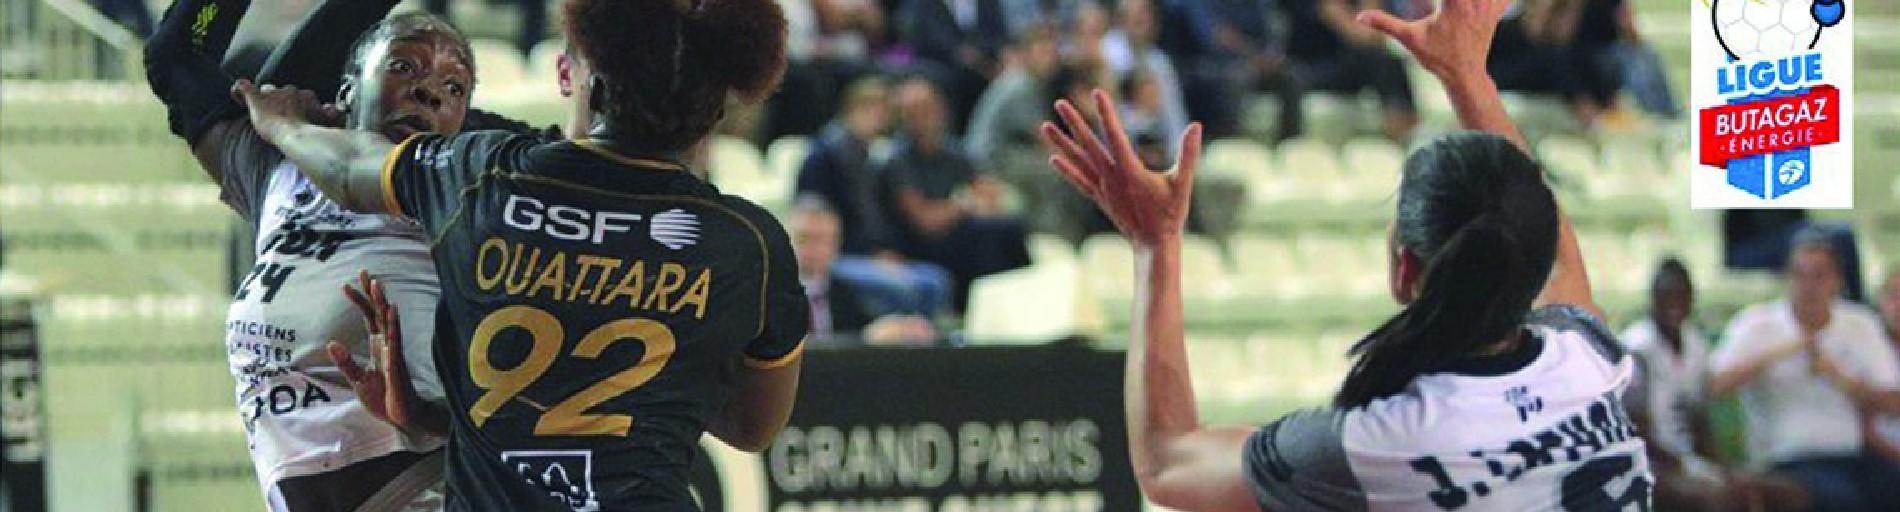 Handball, match de gala